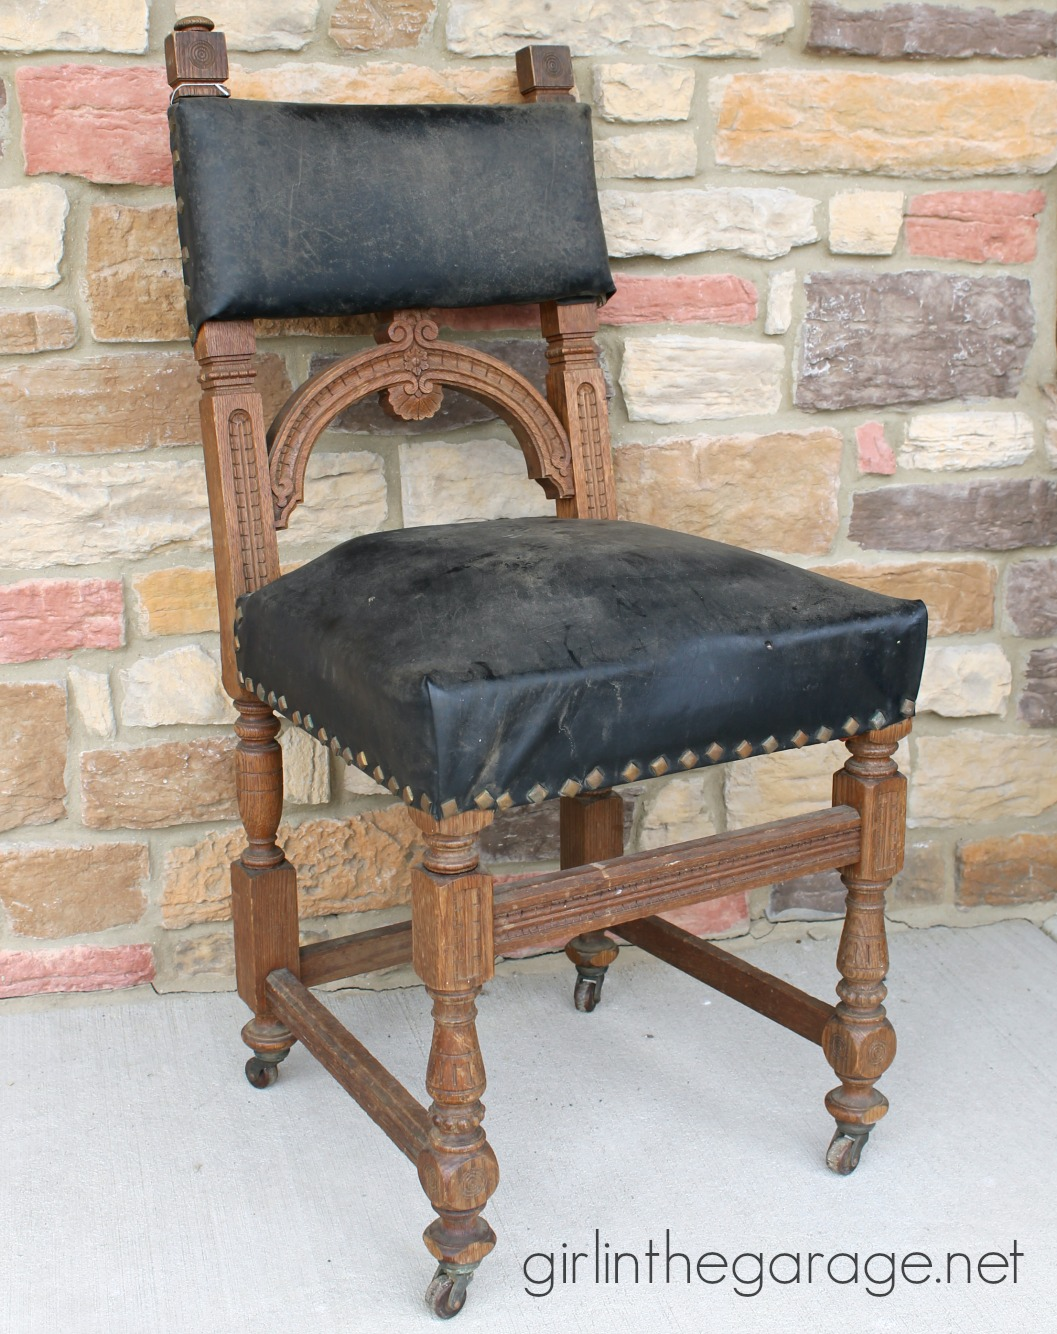 IMG_2591 Antique Wood Chair Yard Sale